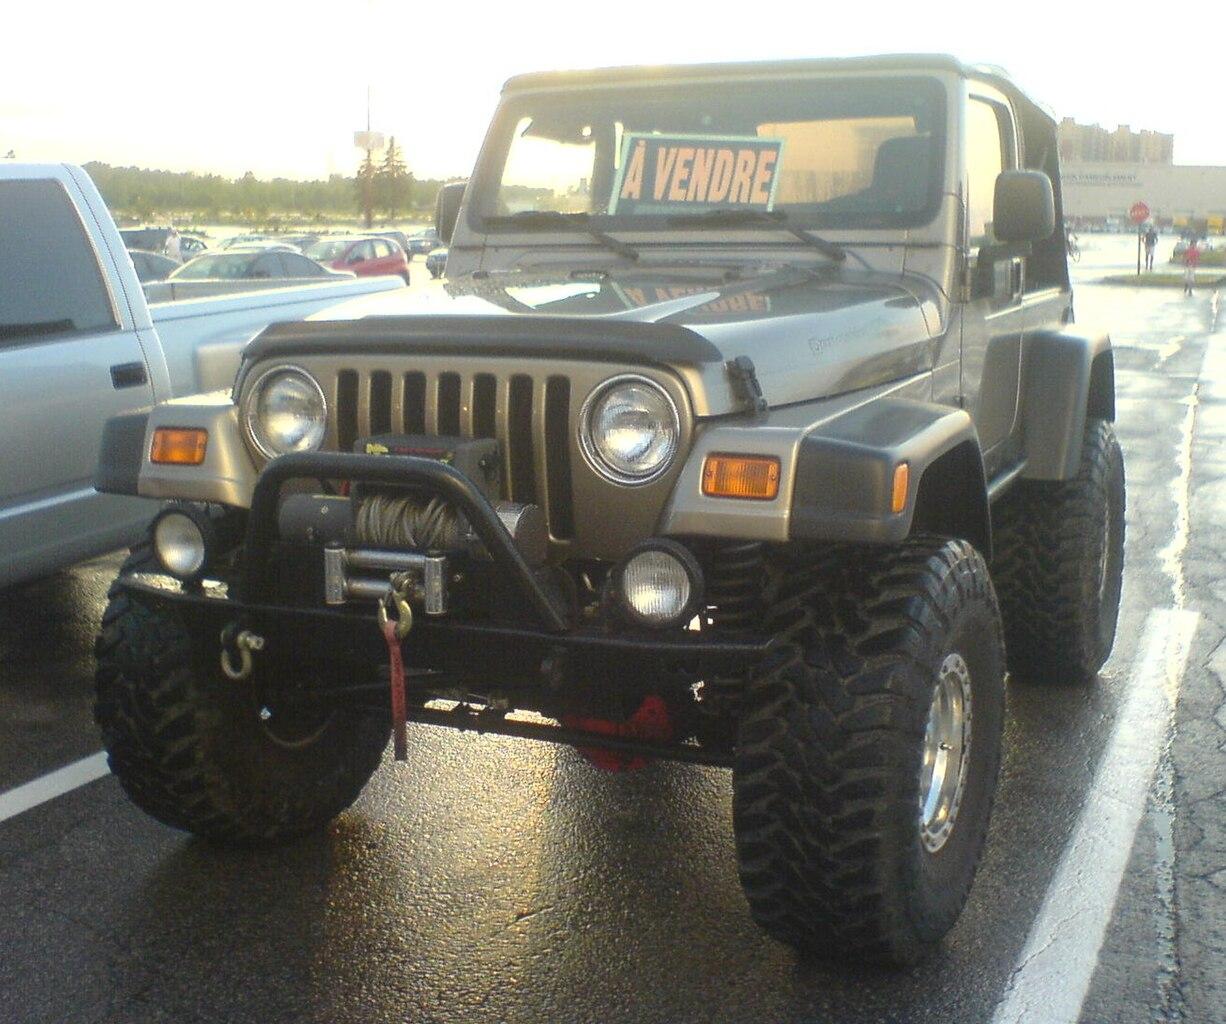 FileTuned Jeep Wrangler TJ (Les chauds vendredis 10)jpg